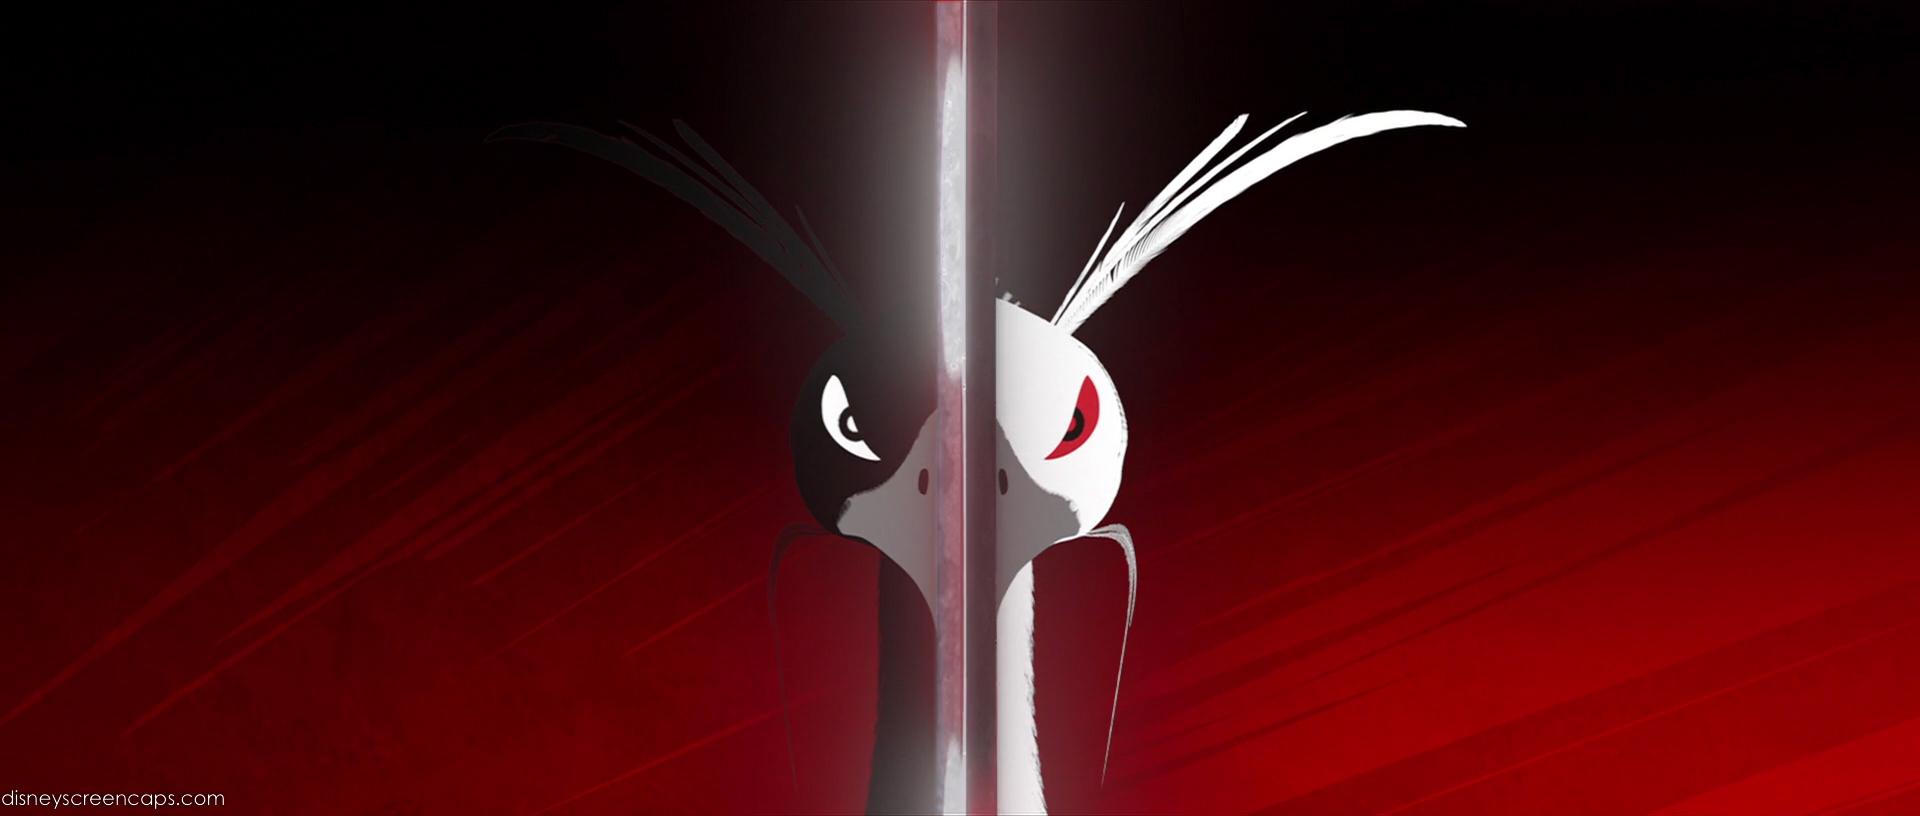 Kung Fu Panda 2 Screencap Lord Shen By Dashiesparkle On Deviantart